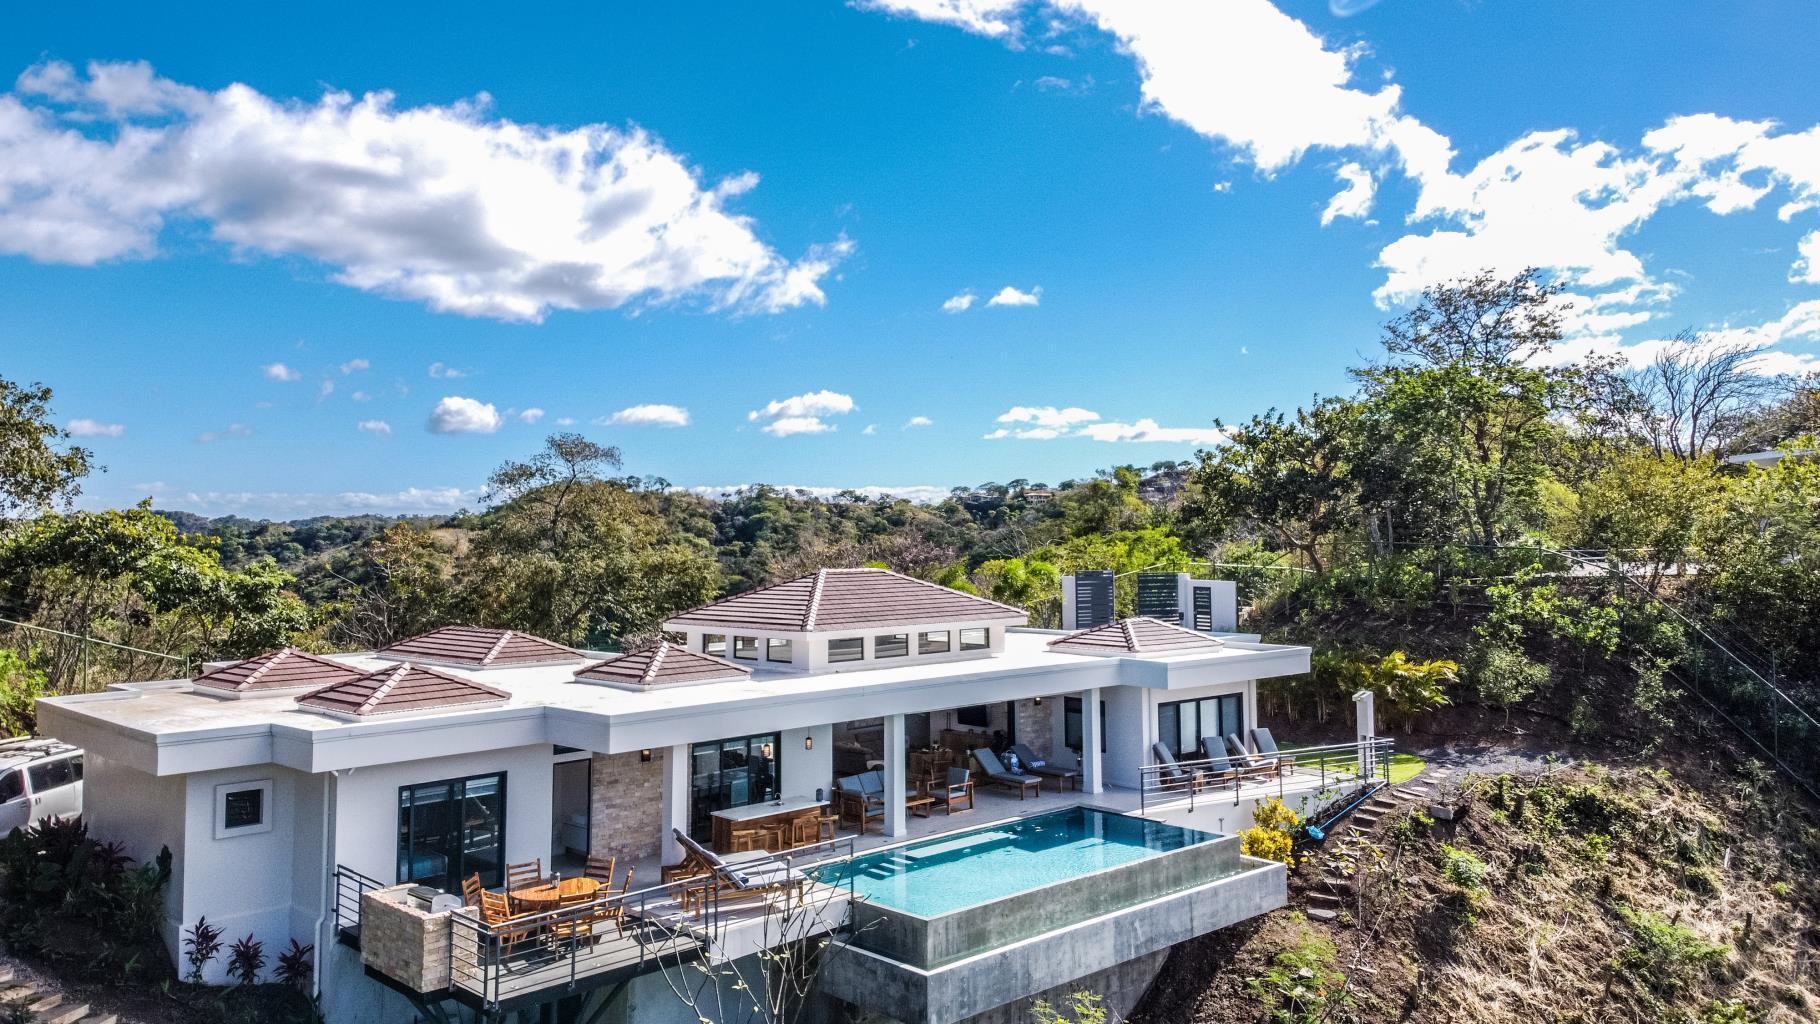 Luxury Home in Playa Hermosa